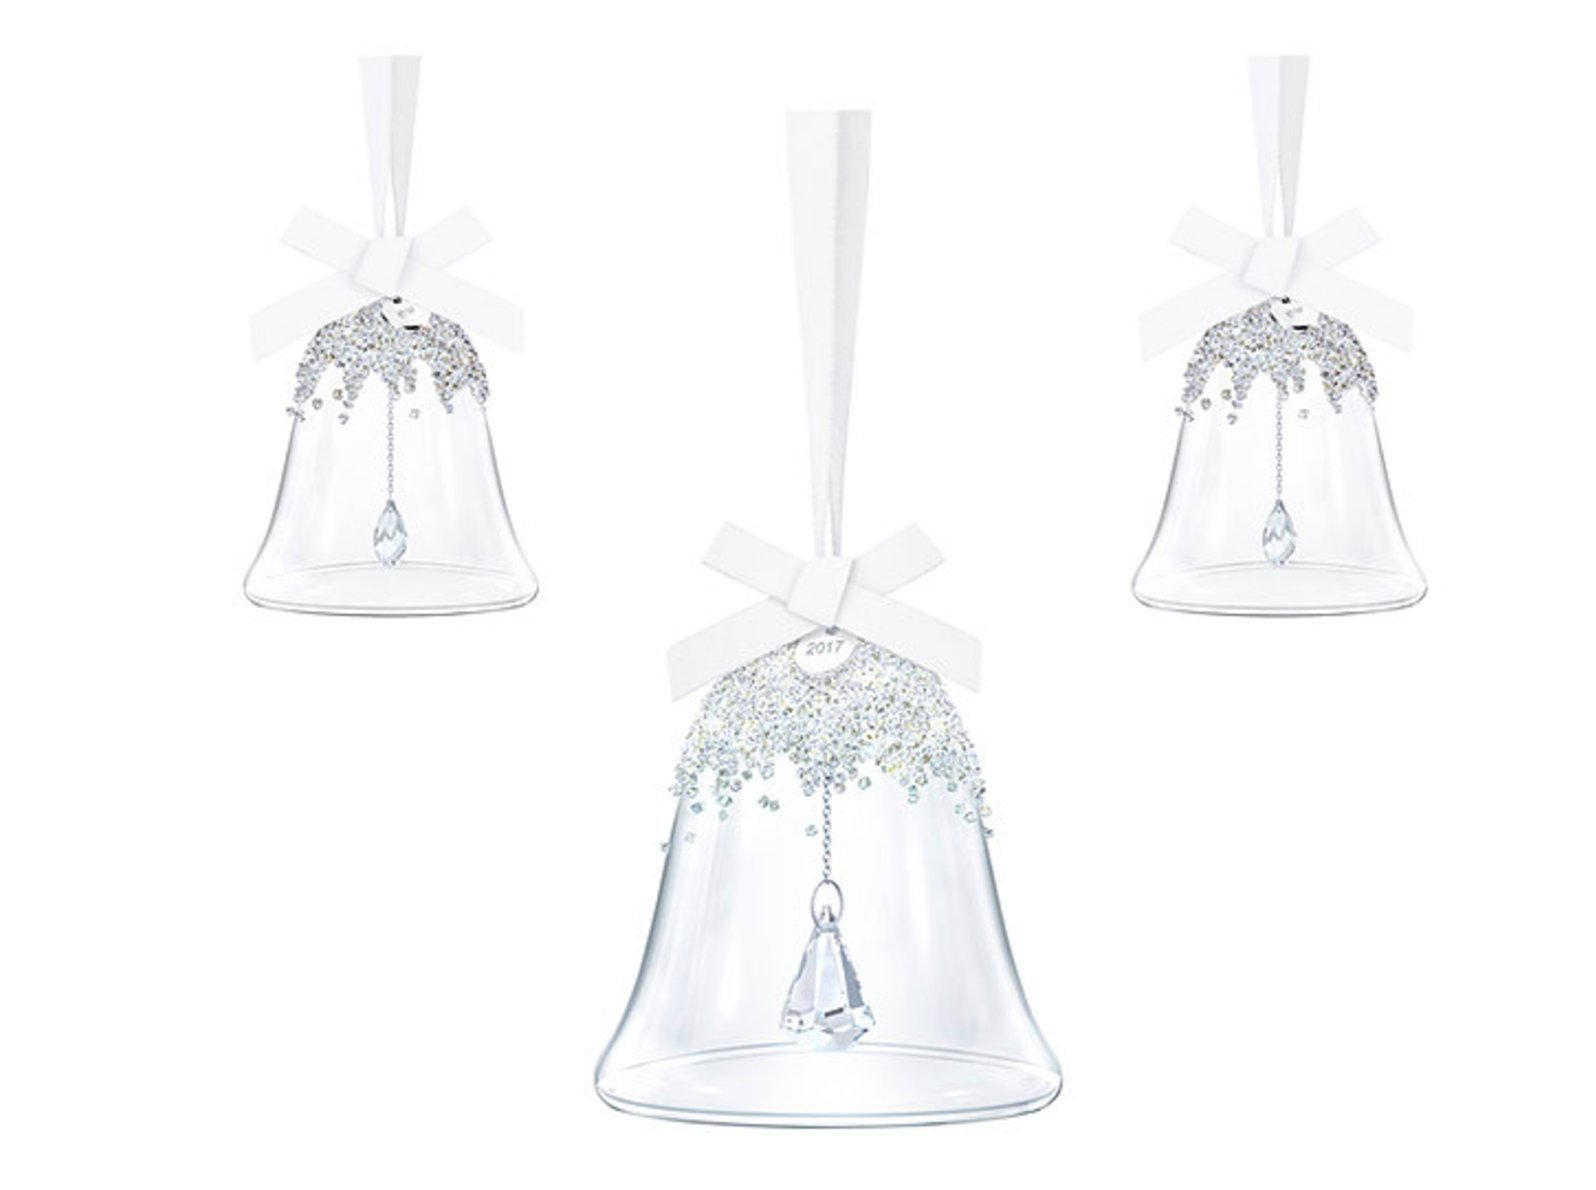 Swarovski Christmas Bell Ornament Set, Annual Edition 2017 5268013